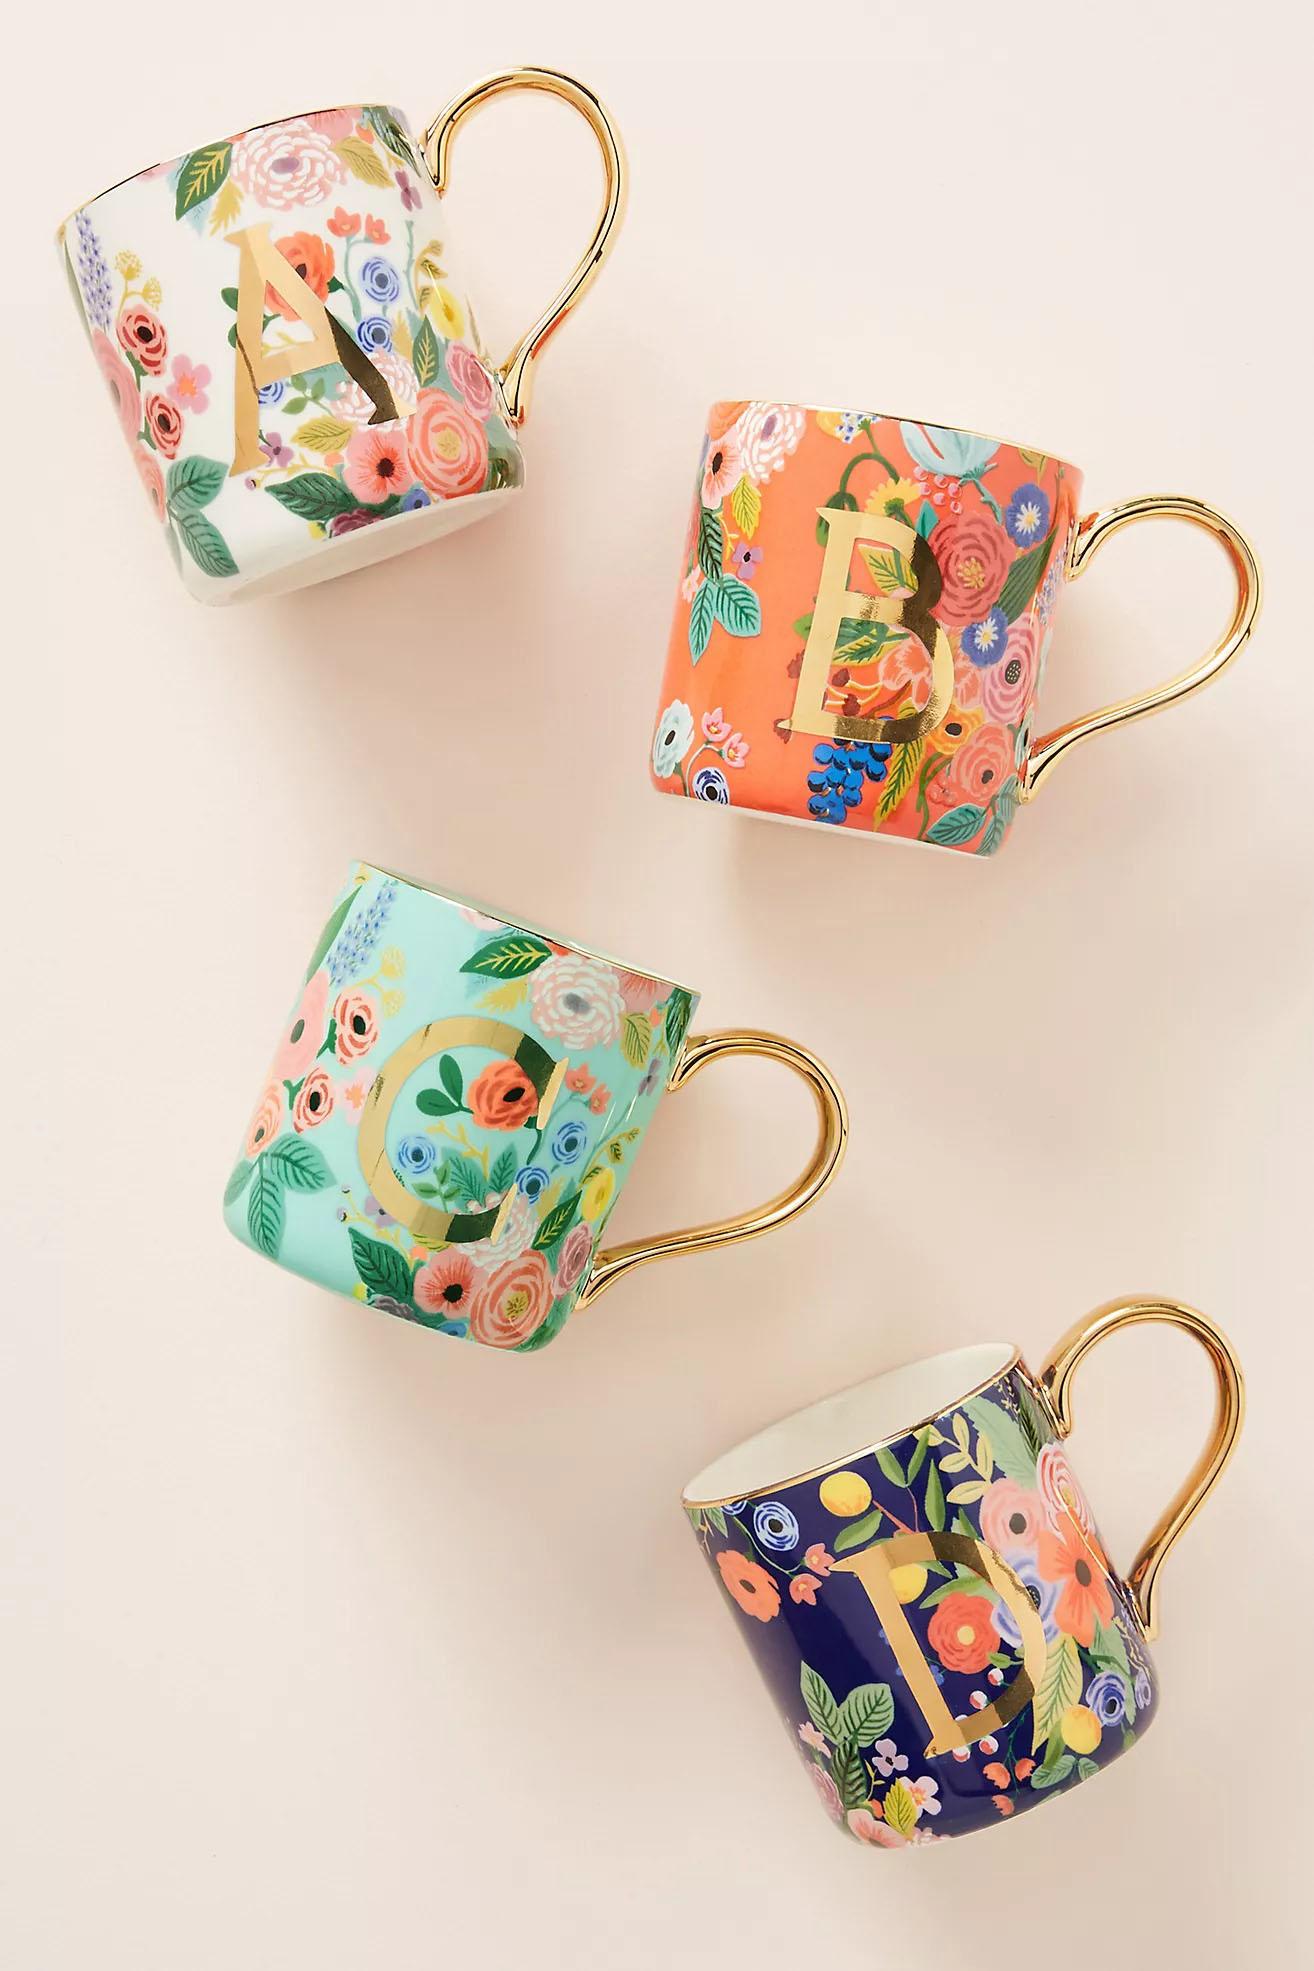 floral Anthropologie bridesmaid mug bridal party gift ideas